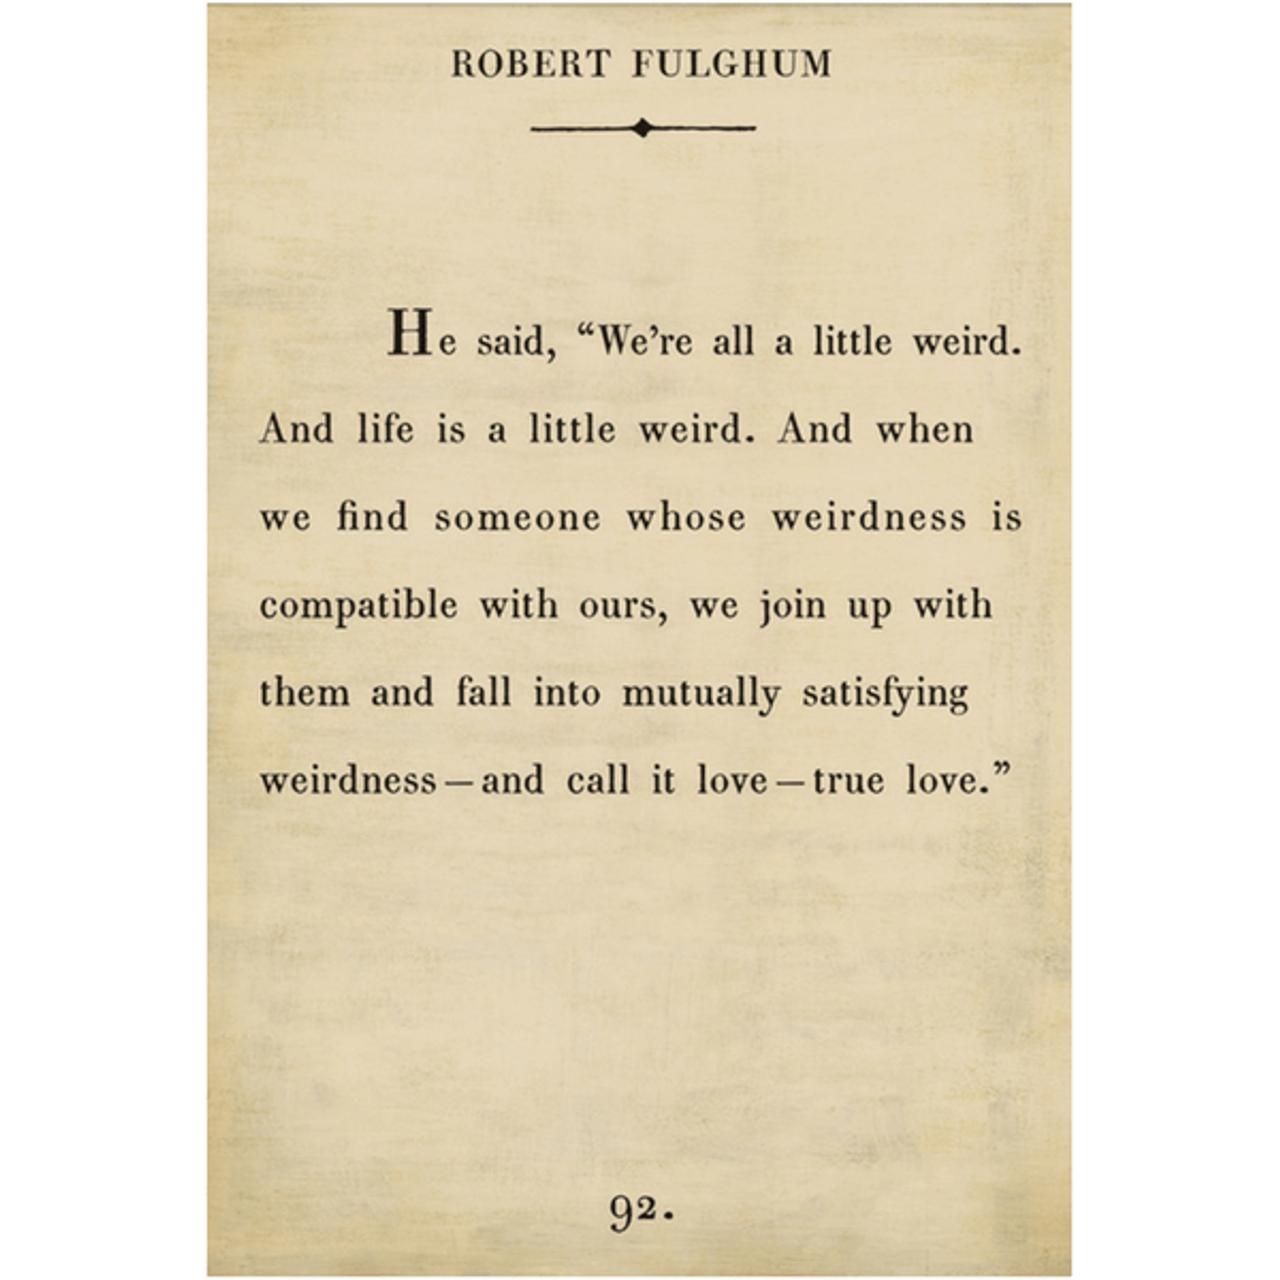 robert fulghum art print - cream with gallery wrap frame